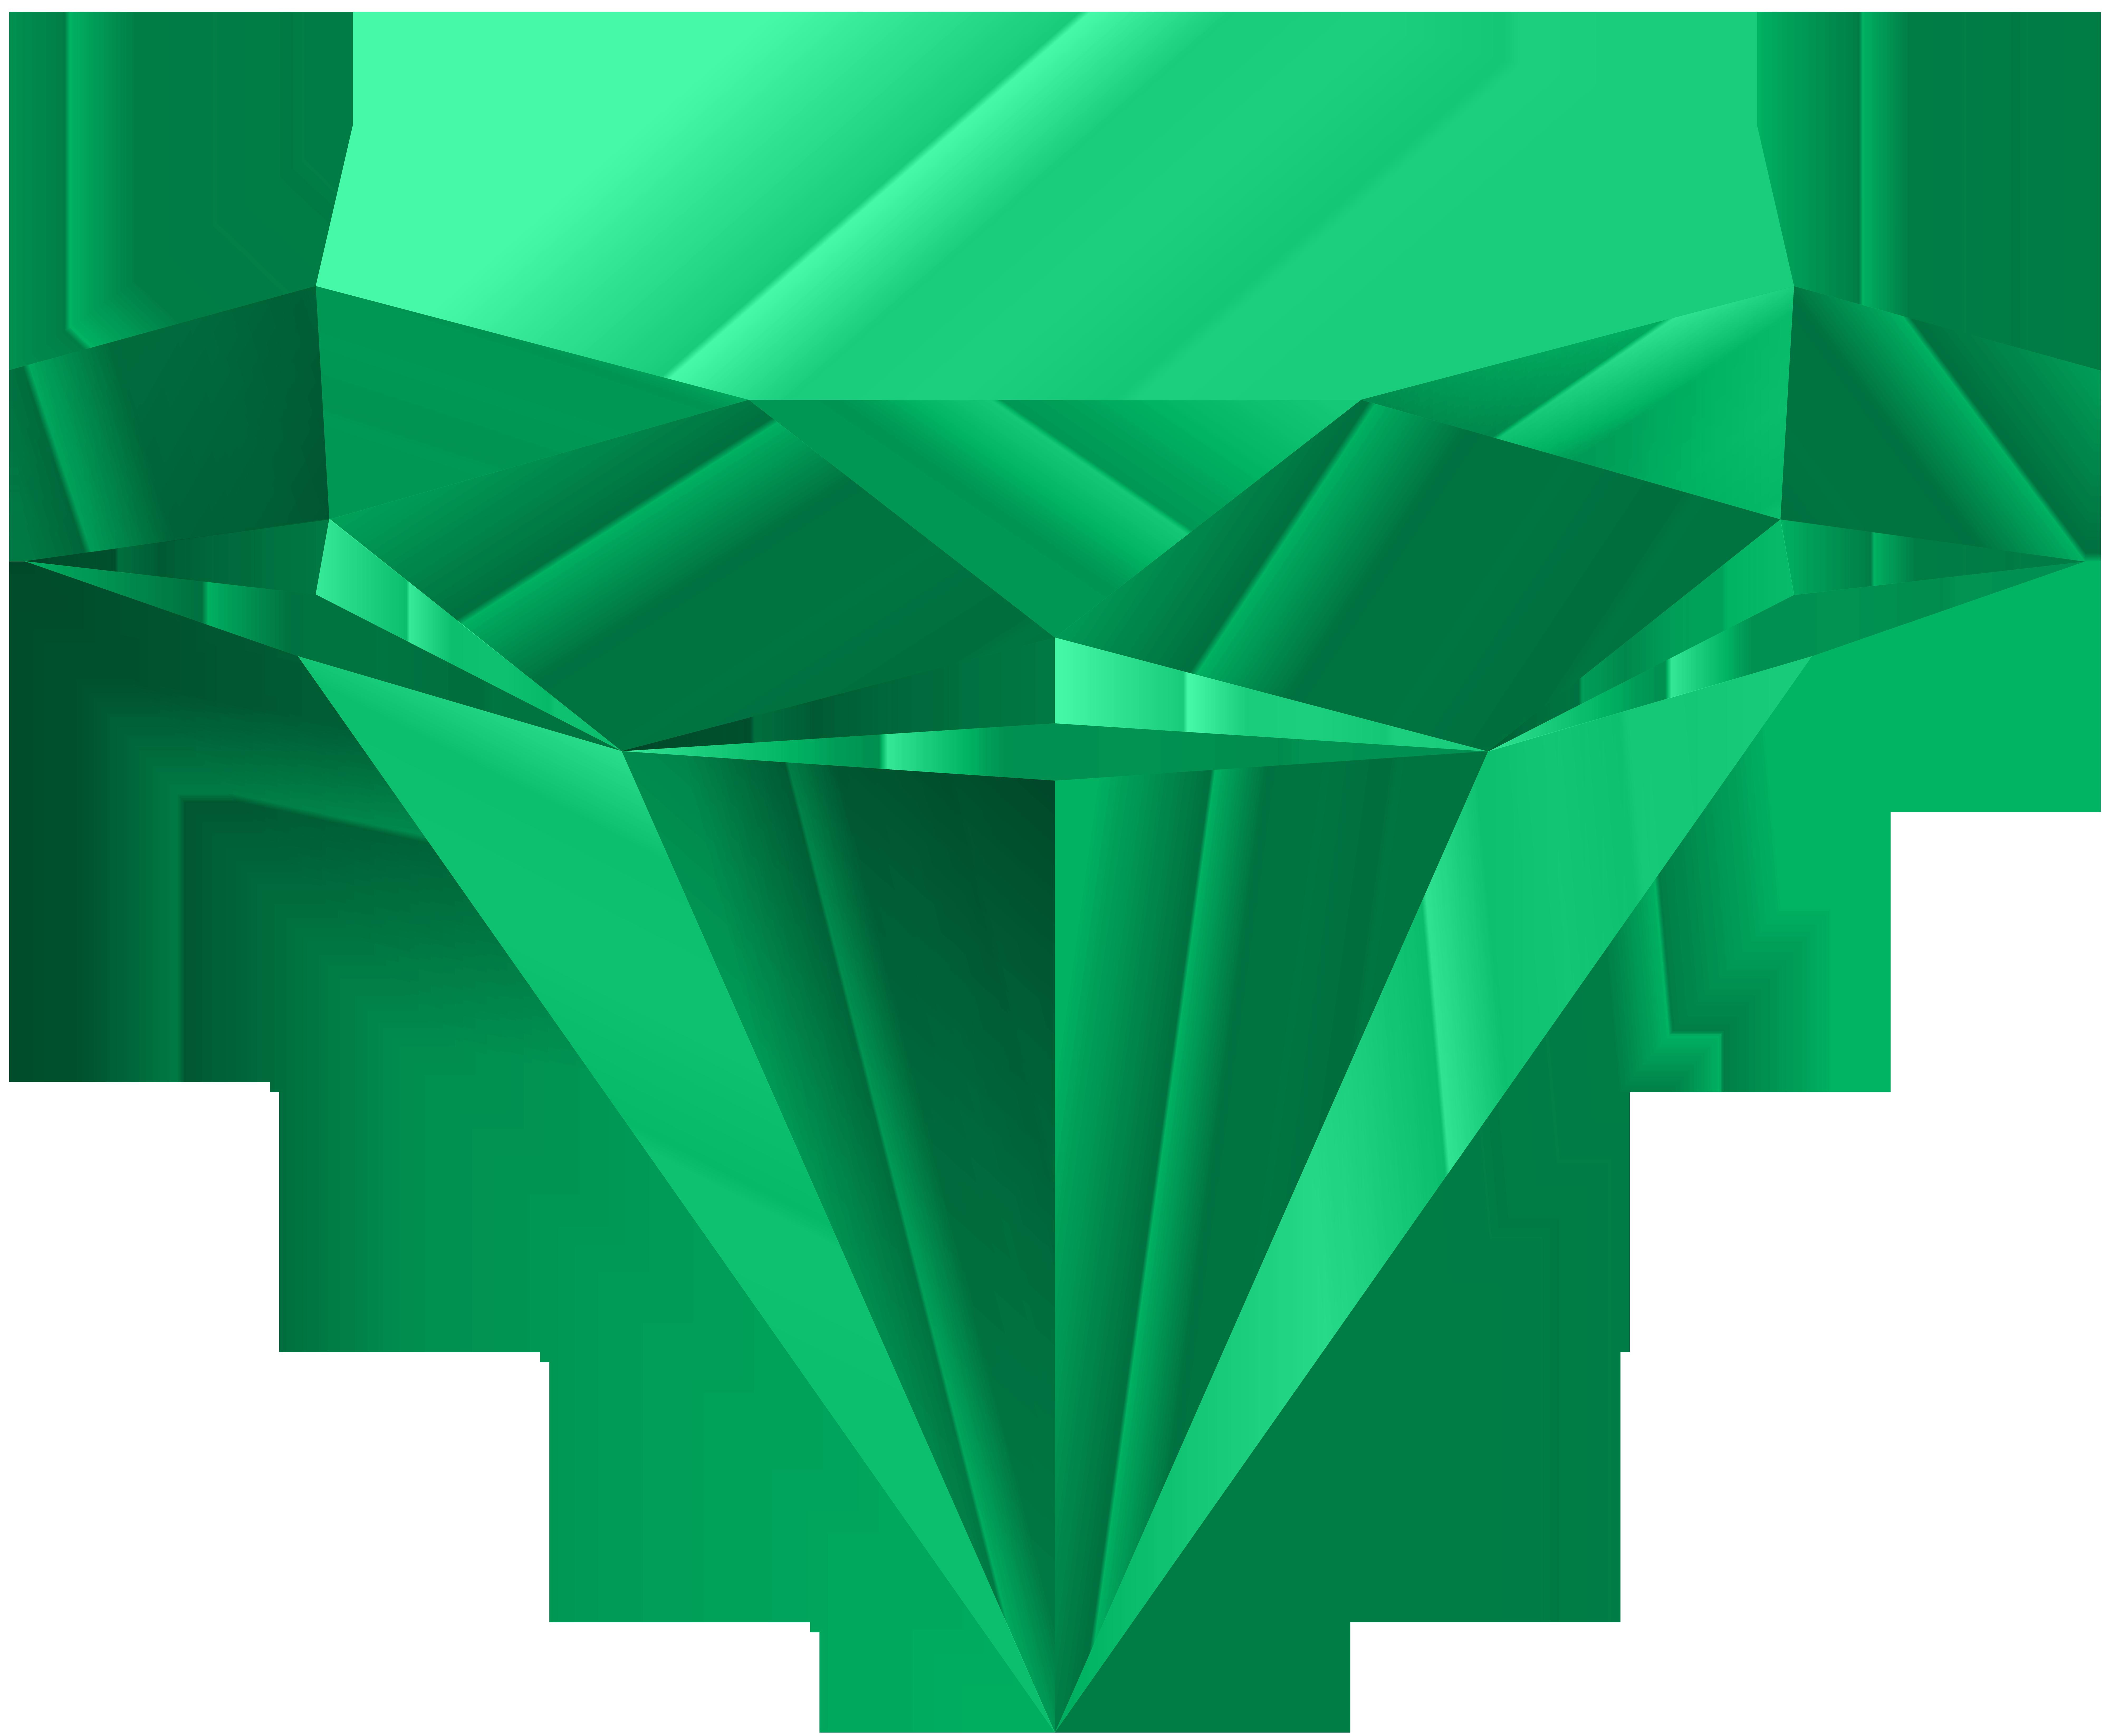 Green png clip art. Diamonds clipart small diamond